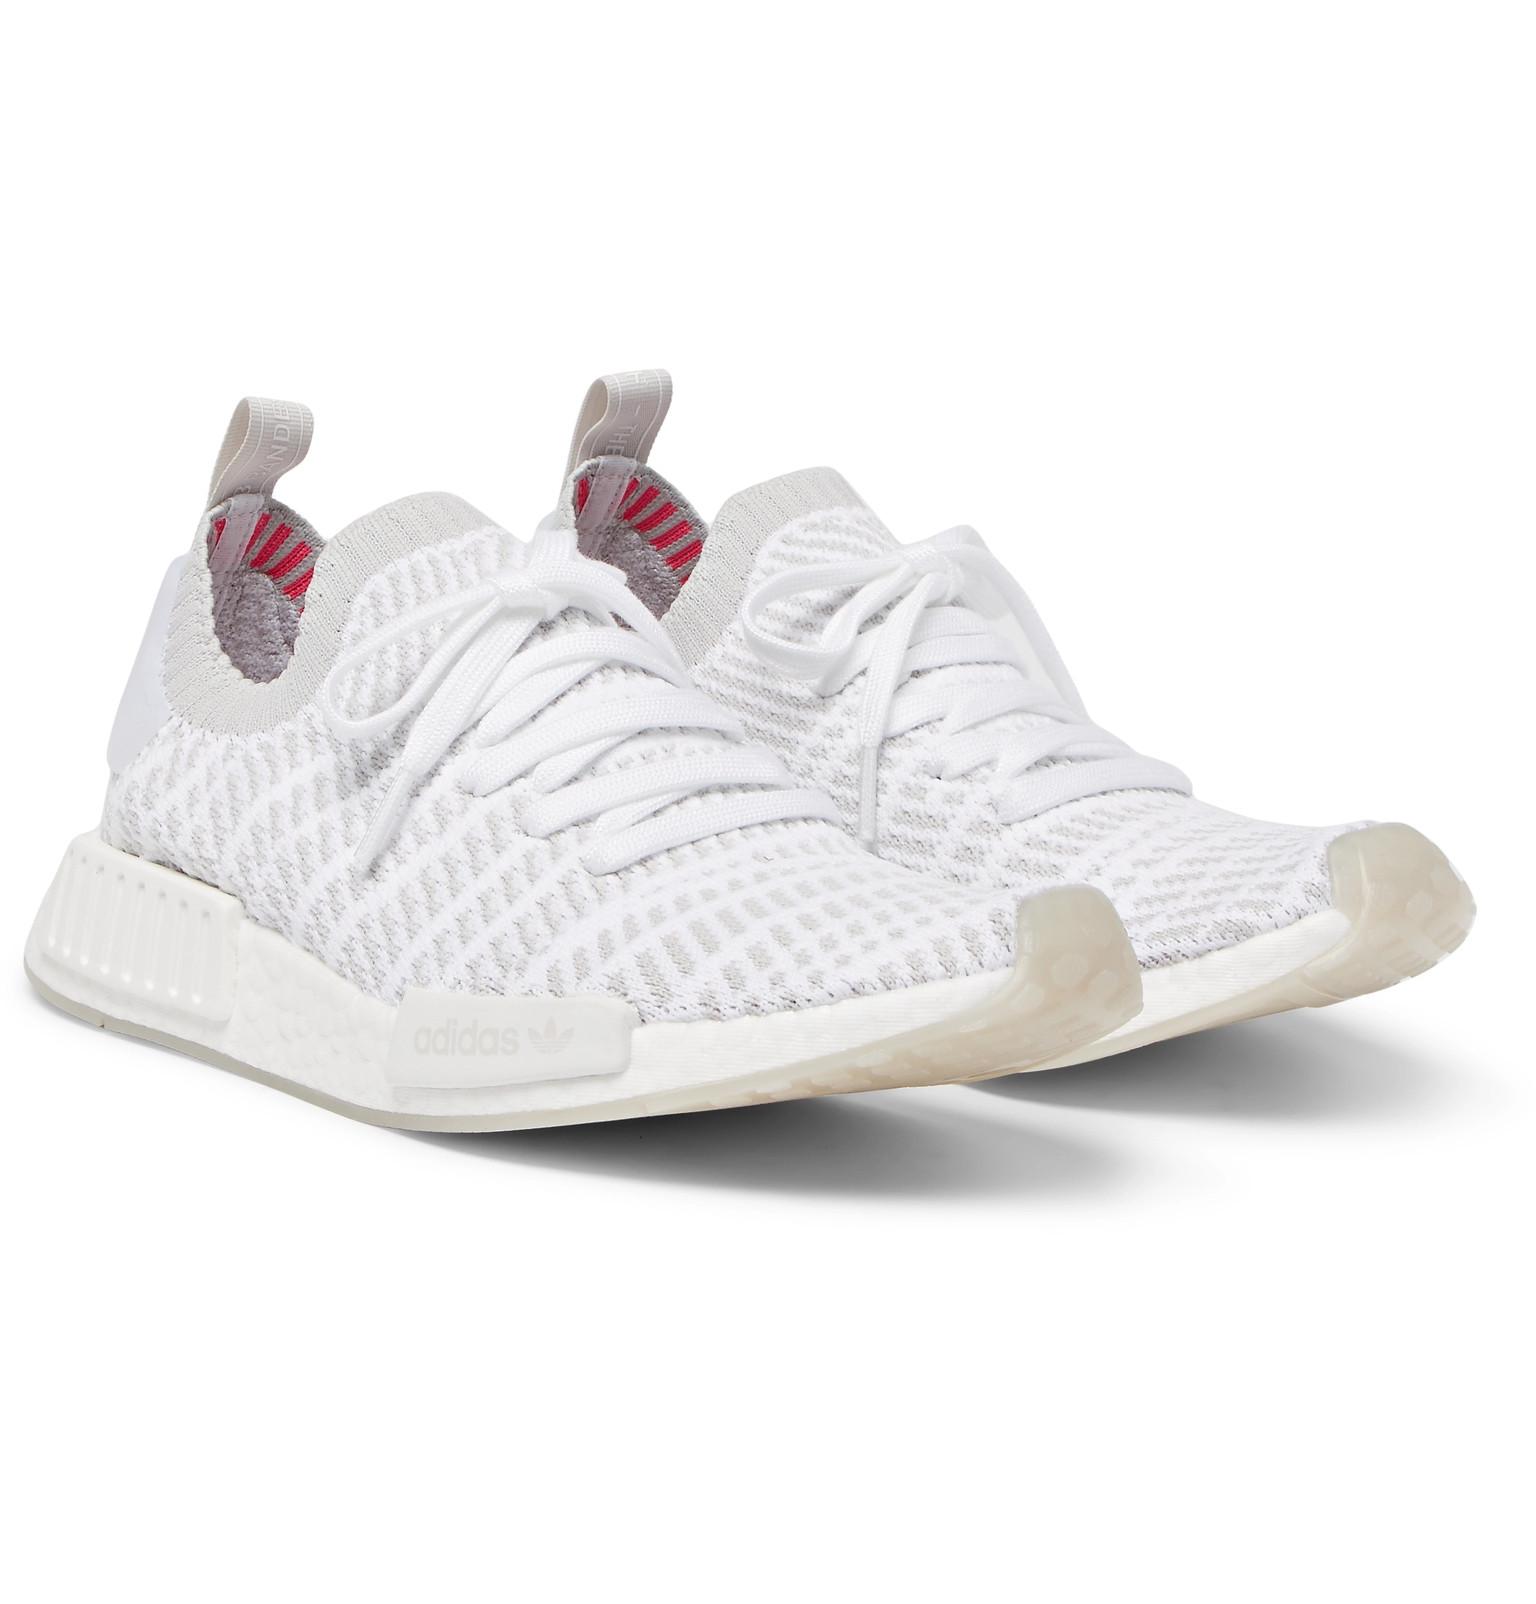 Adidas Originals Nmd R1 Stlt Primeknit Sneakers